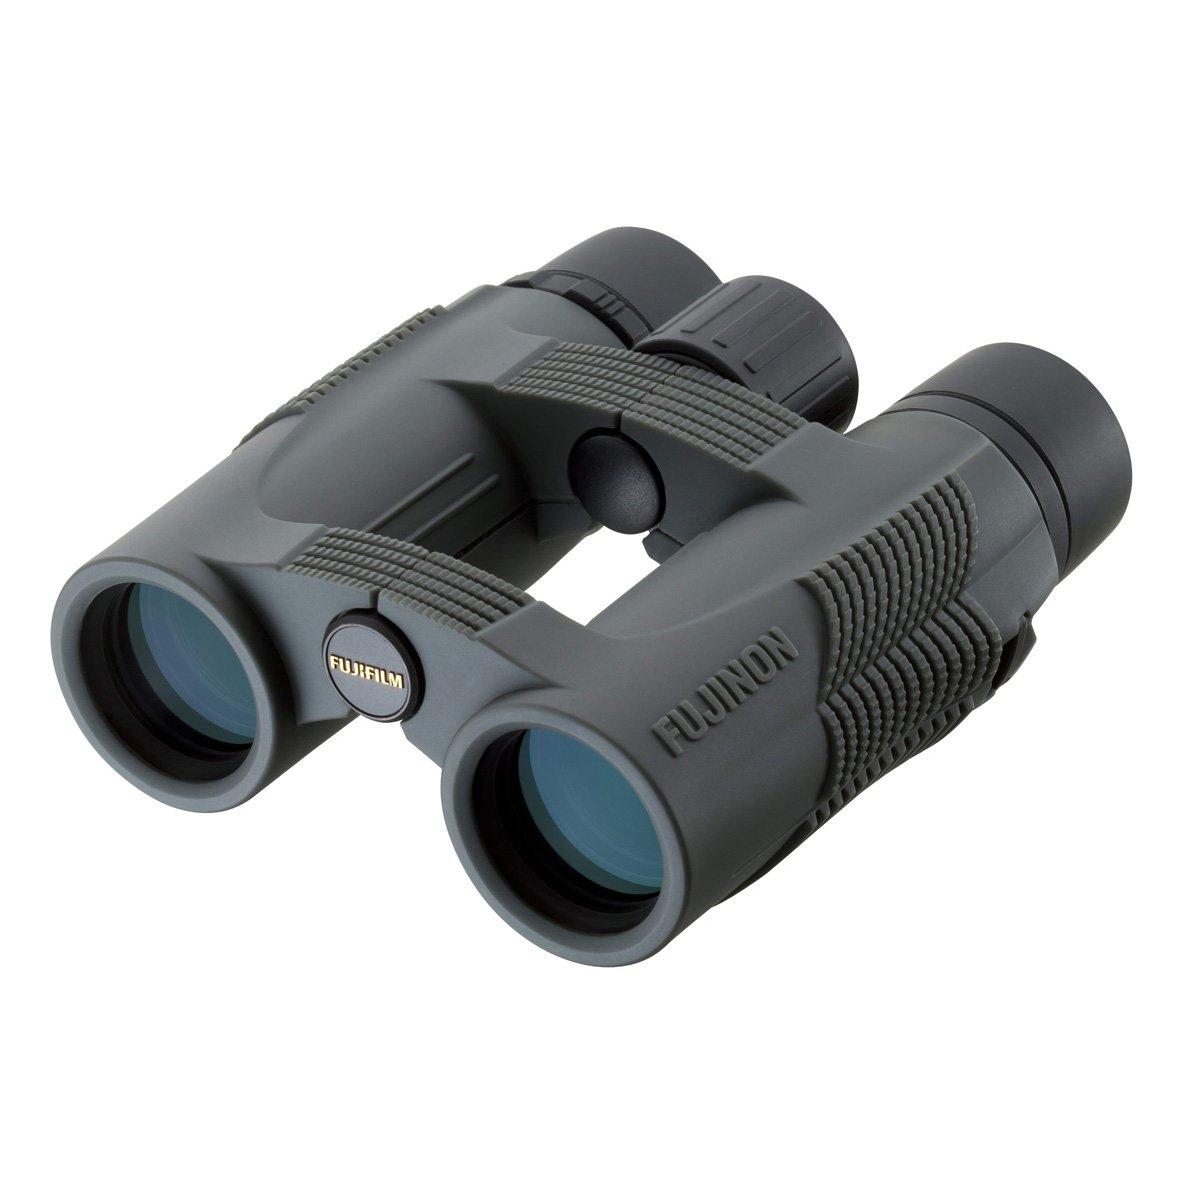 FUJINON 双眼鏡 KFシリーズ 8×24 H ダハプリズム式 8倍 24口径 完全防水 344479 B074173GV1 口径24㎜H|8倍  口径24㎜H